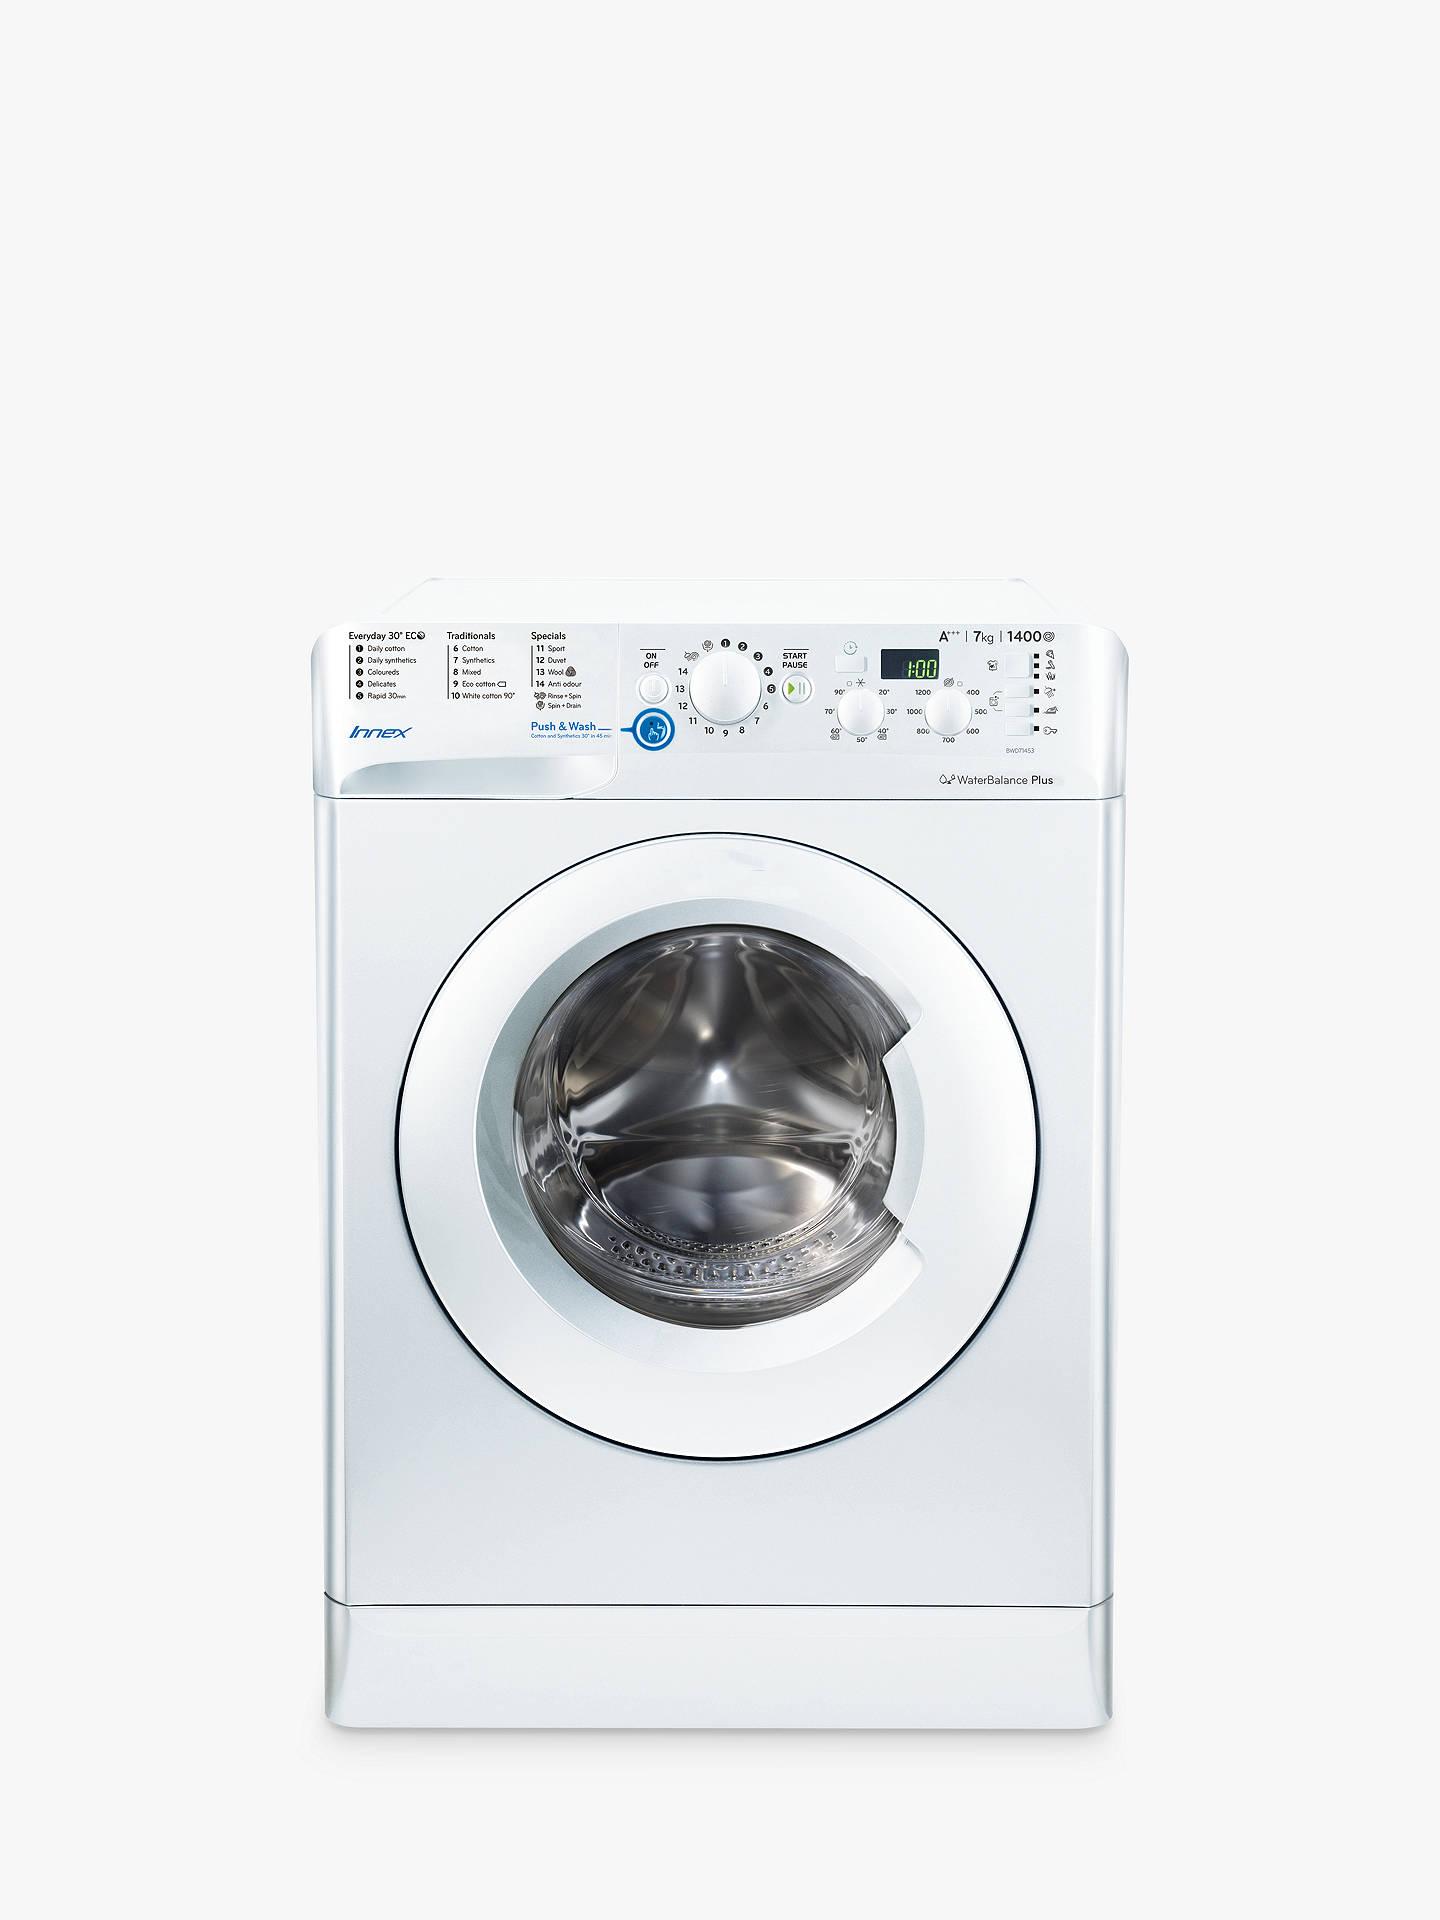 Indesit Innex Bwd71453wuk Freestanding Washing Machine 7kg Load A